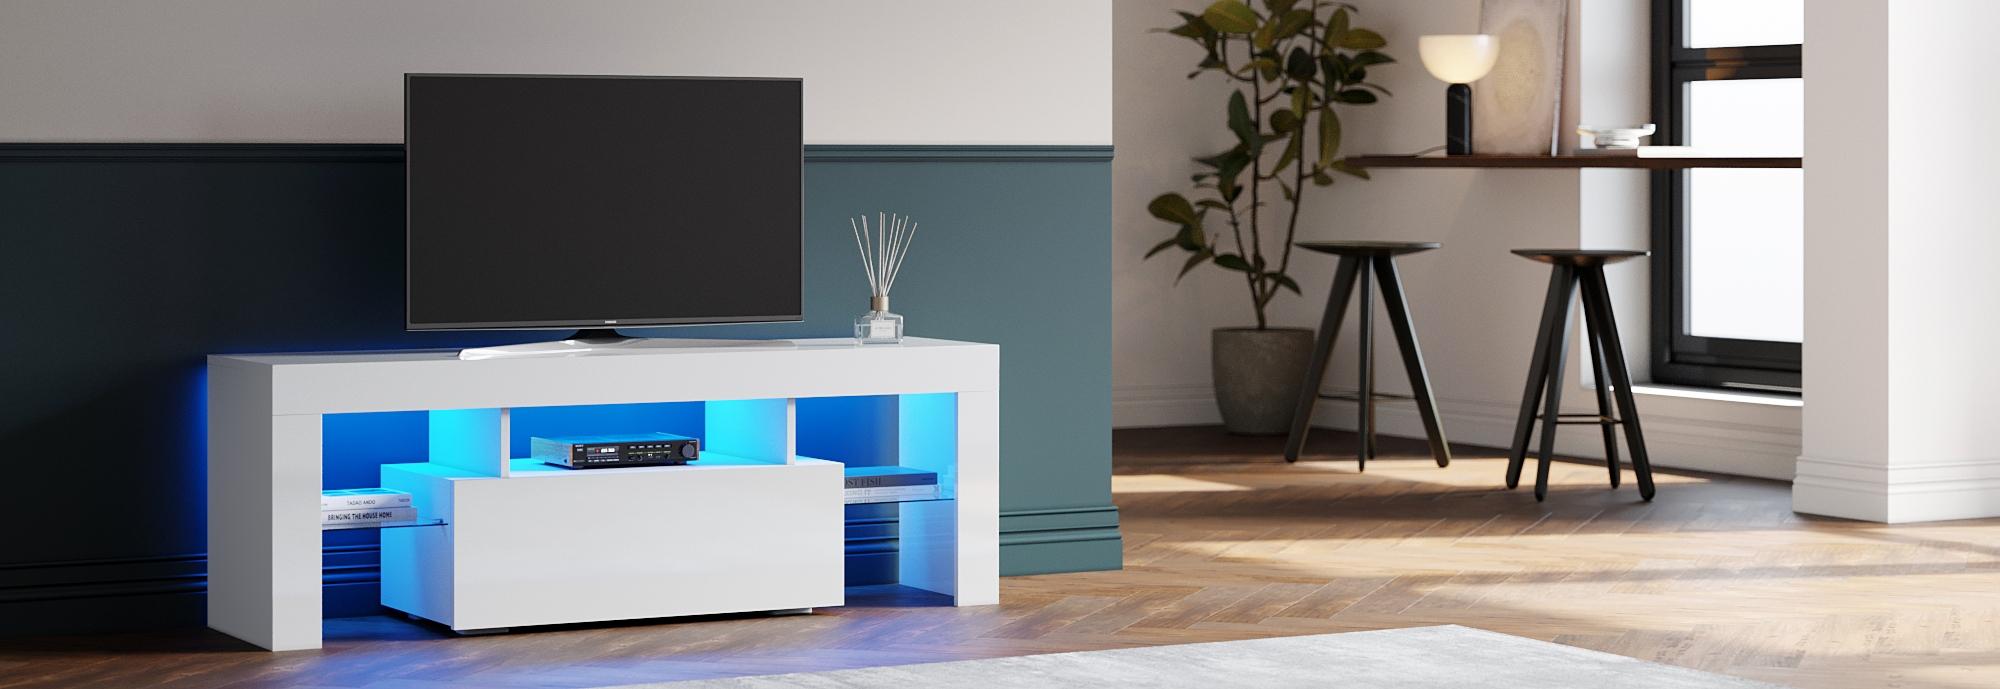 Modern Tv Units & Stands